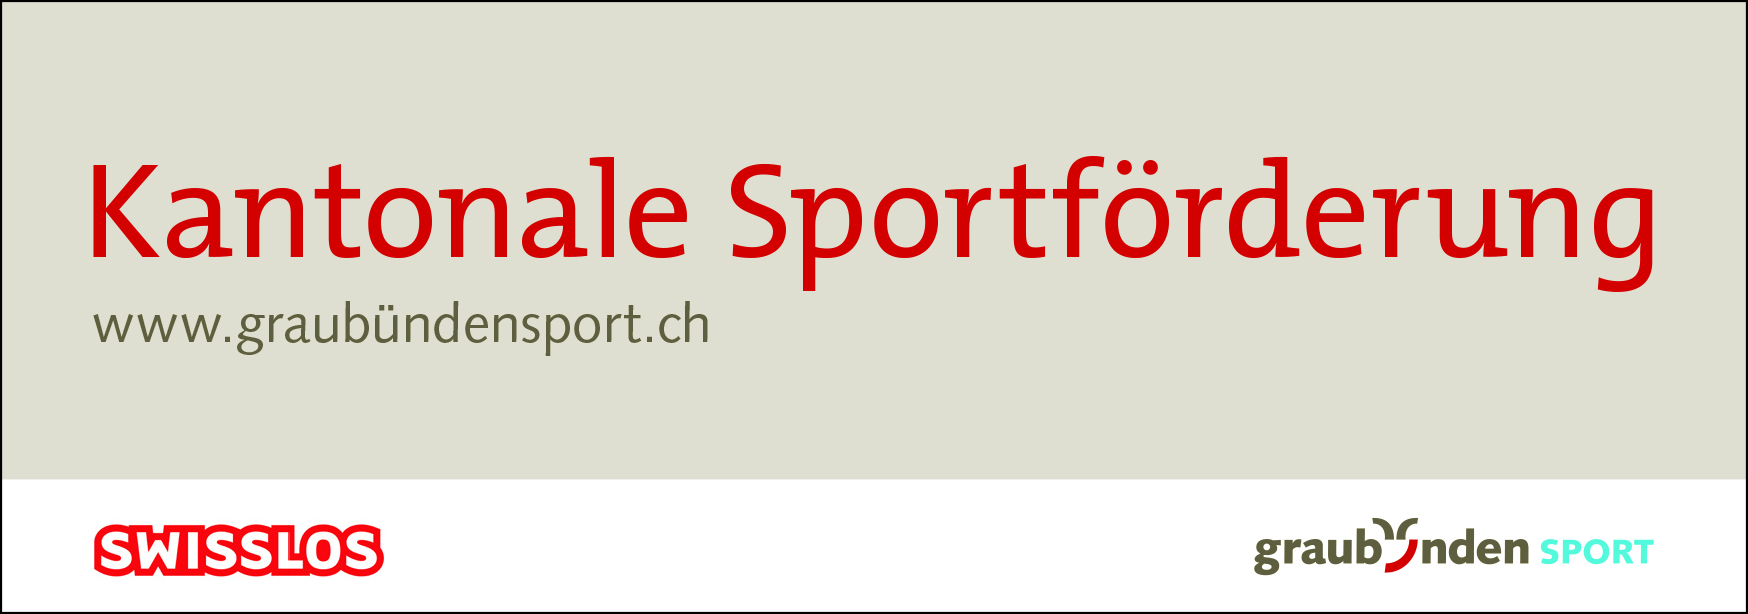 Kantonale Sportförderung Graubünden